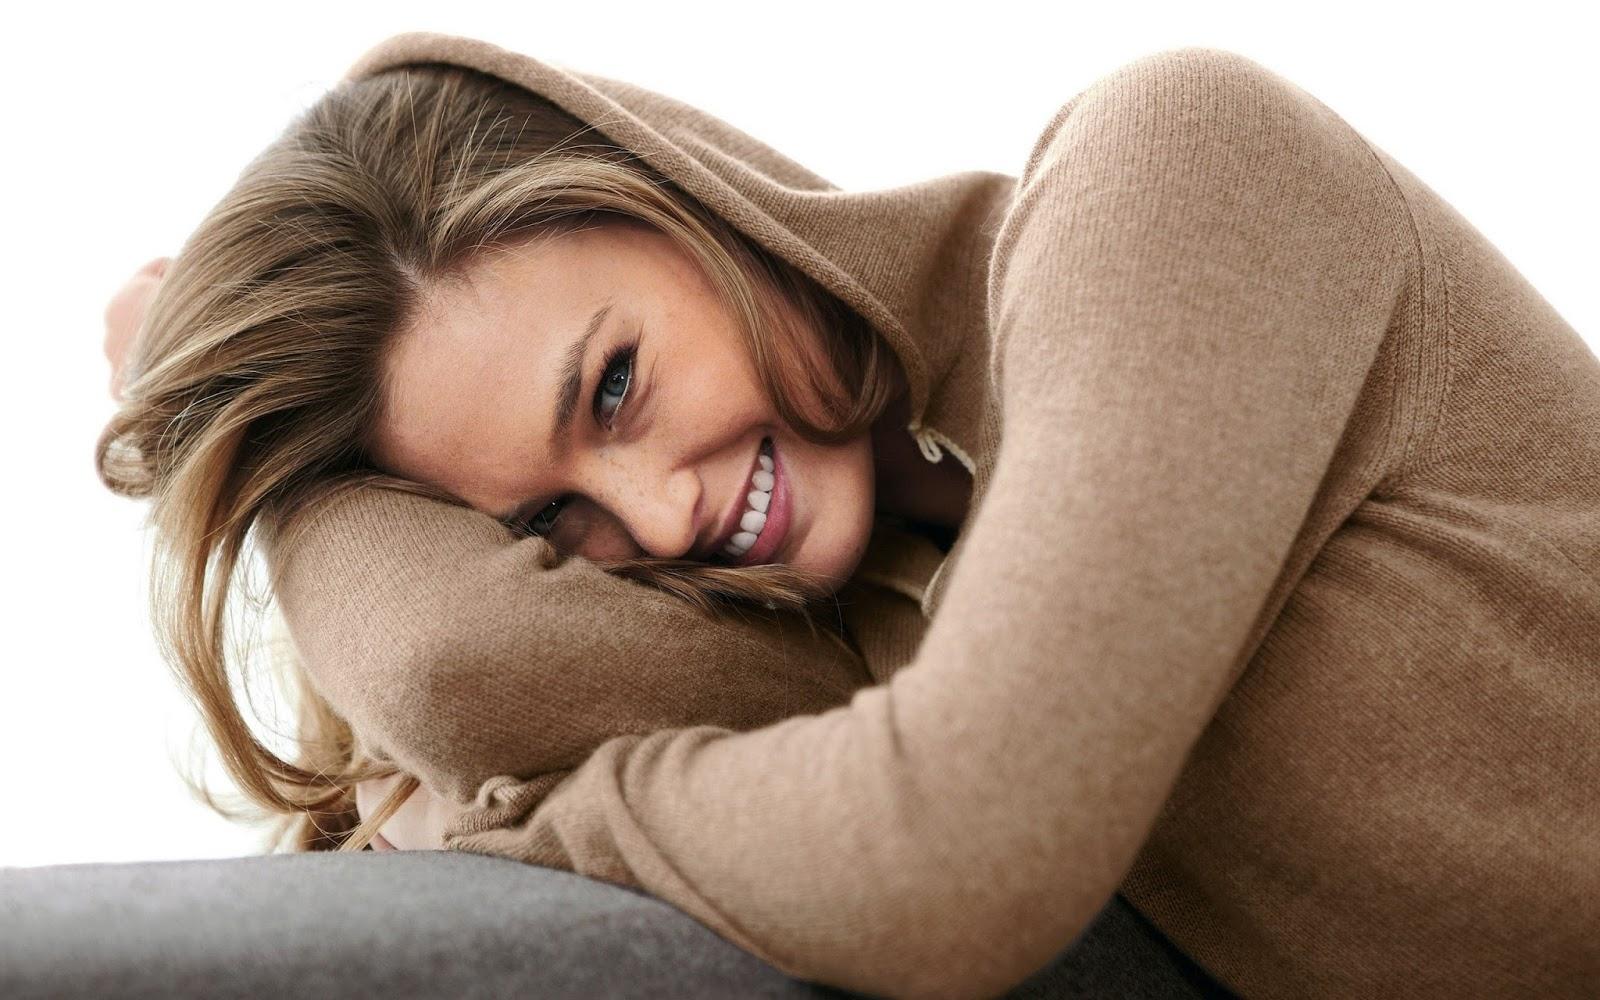 Female Model Wallpapers